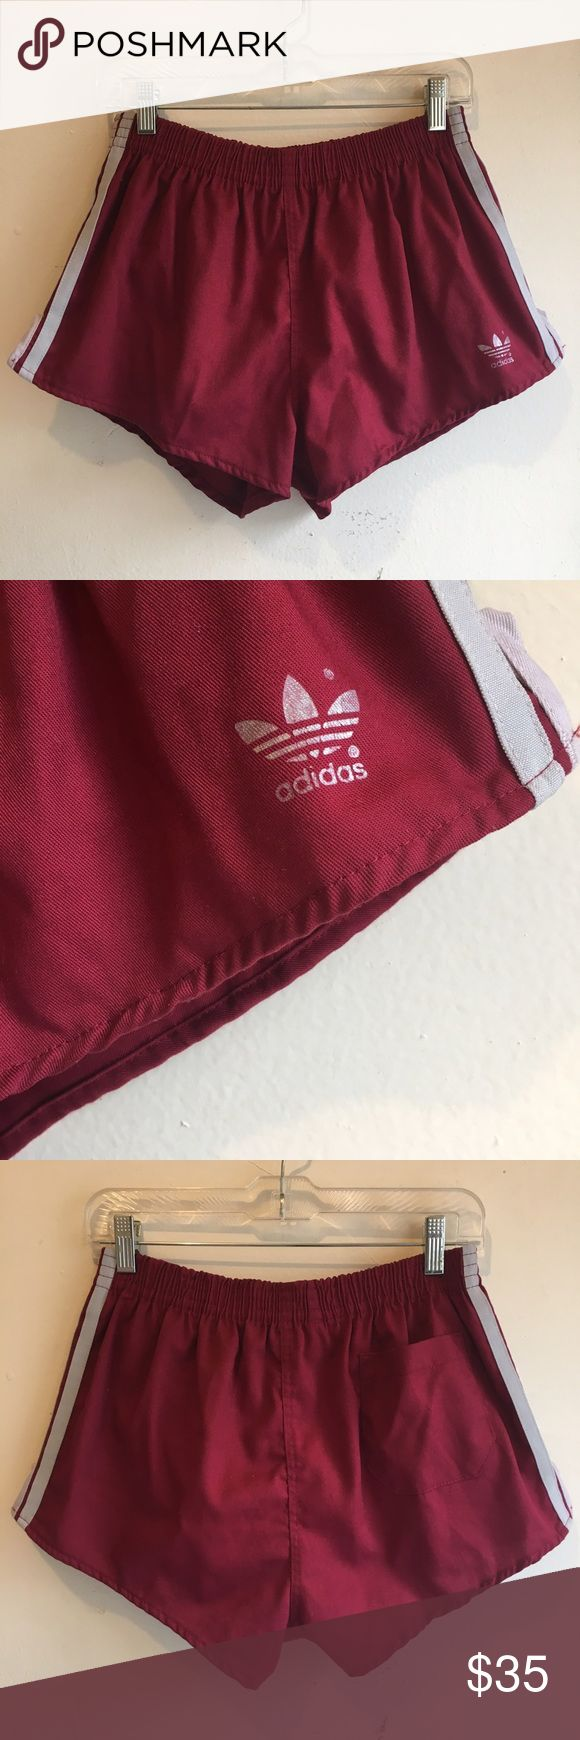 Adidas Soccer Shorts Vintage Adidas soccer shorts in perfect condition. Built in briefs. One back pocket. Drawstring. #K103 Adidas Shorts